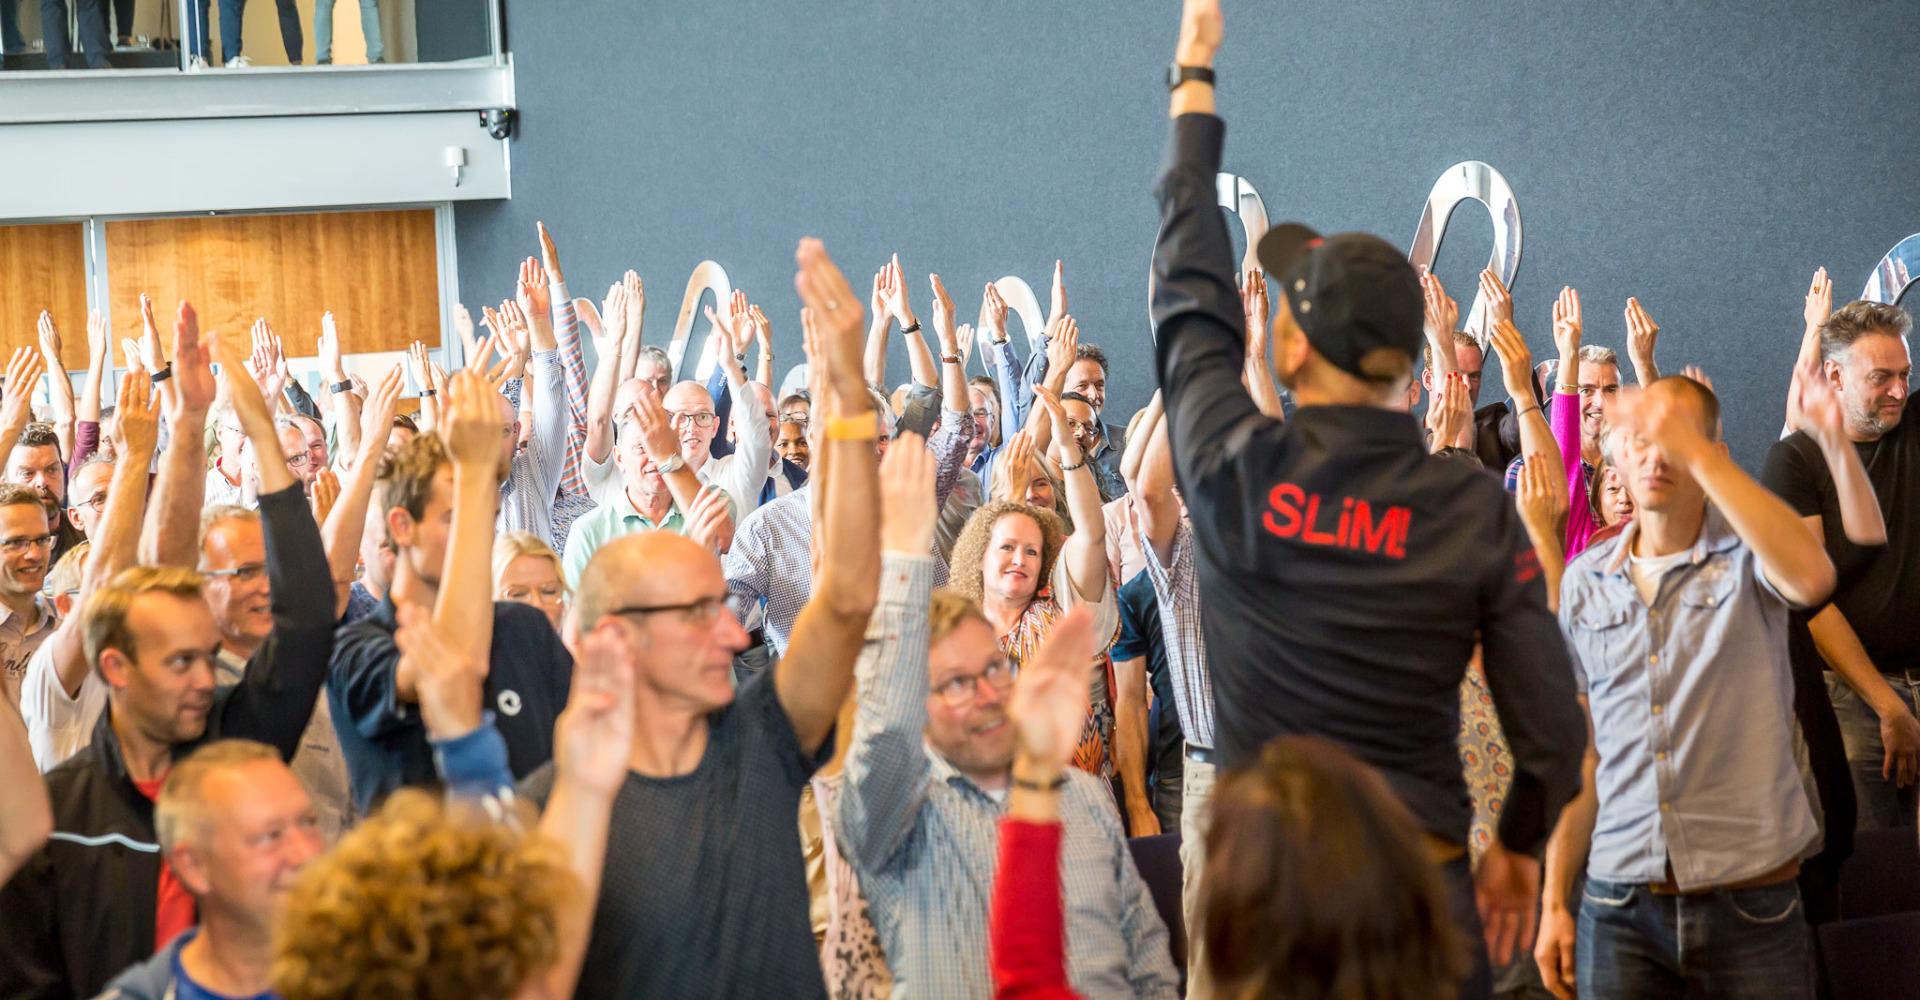 Inspirerende spreeksessies en online webinars over vitaliteit, talent en teamwork